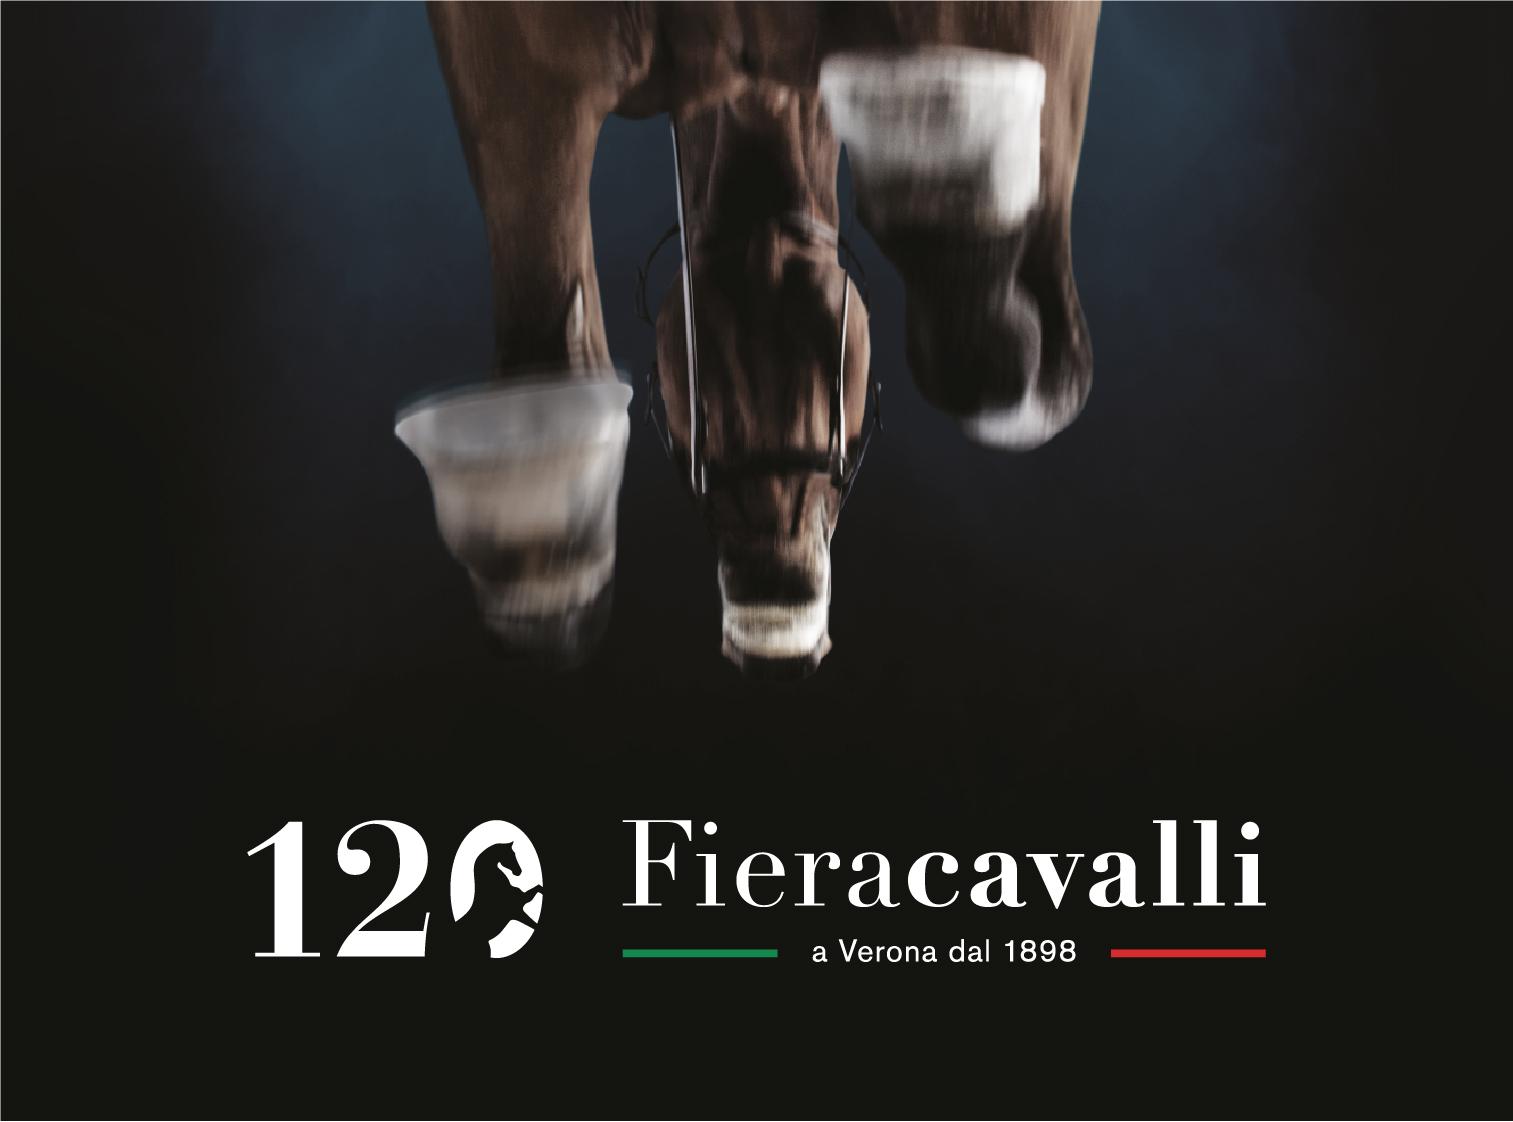 f cavalli